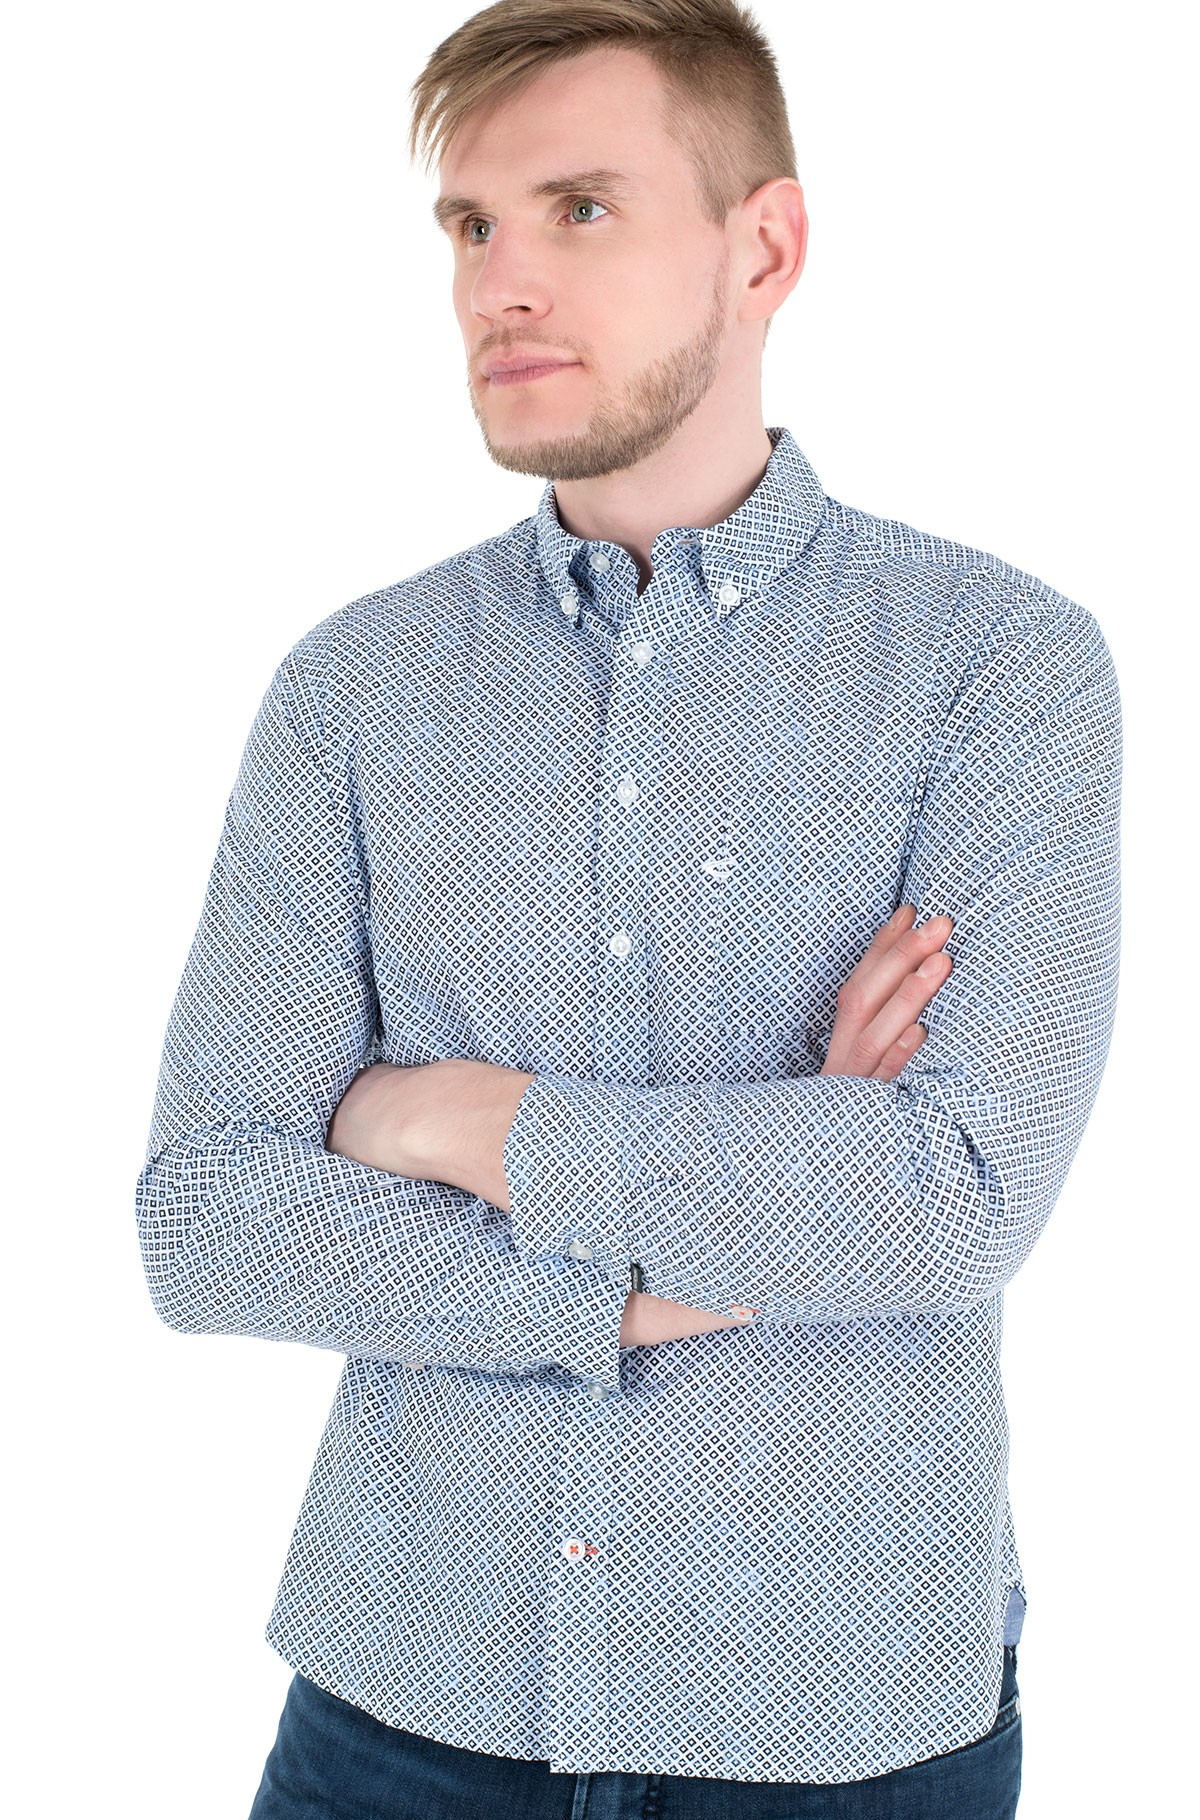 Marškiniai 409114/5S04-full-1